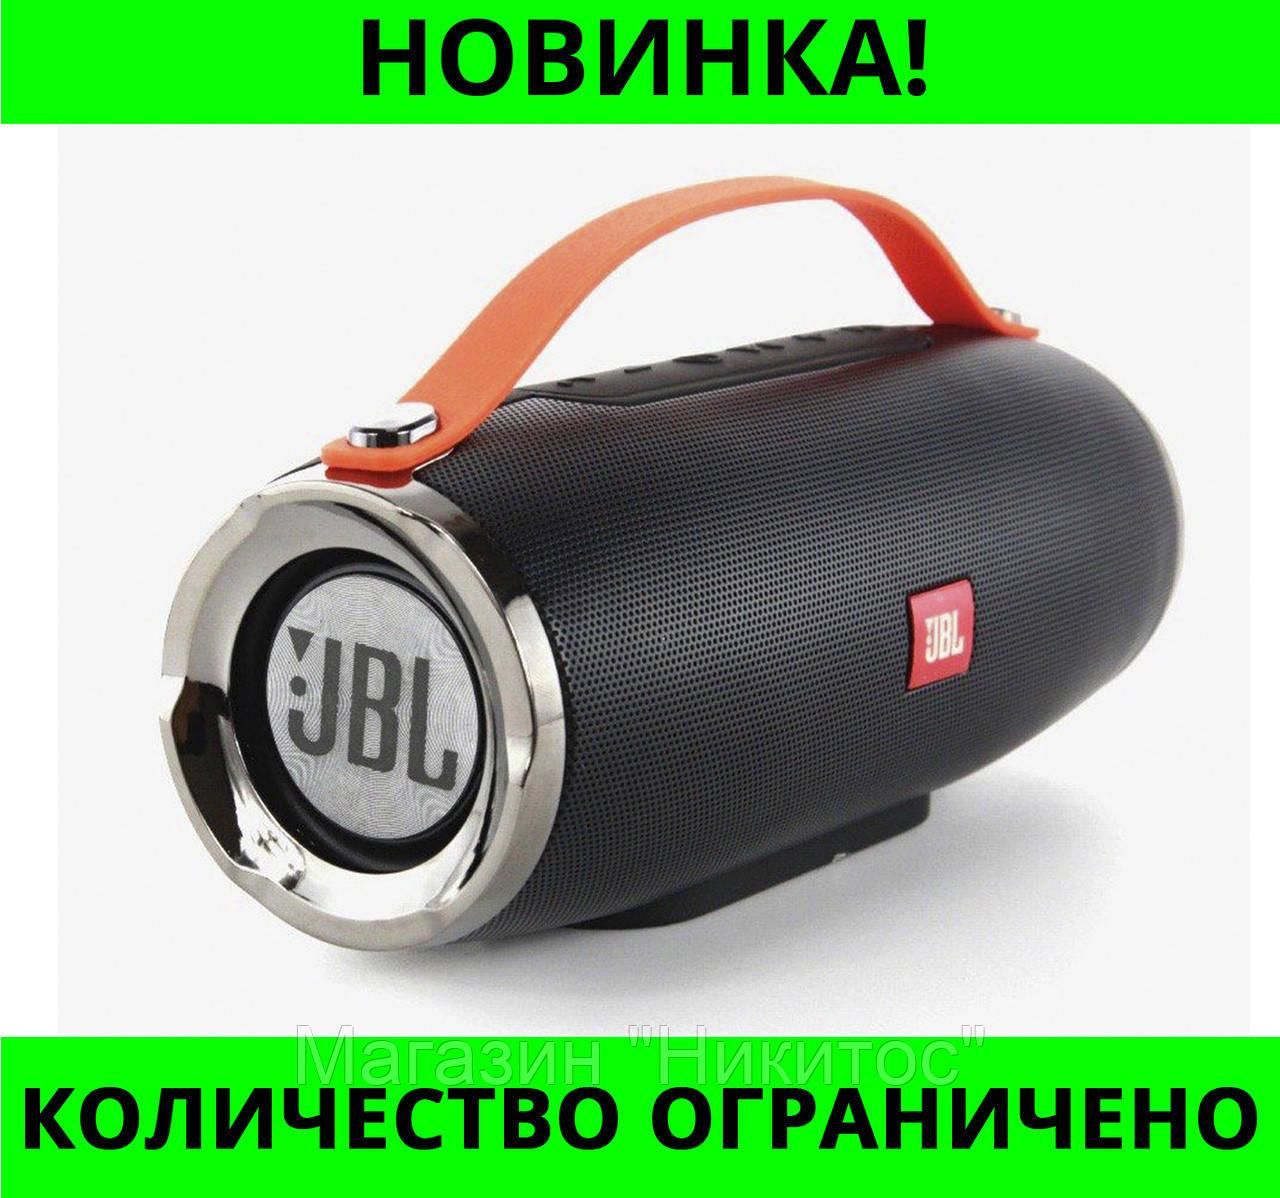 SALE!Портативная Bluetooth колонка JBL Charge K5+ (Красная)